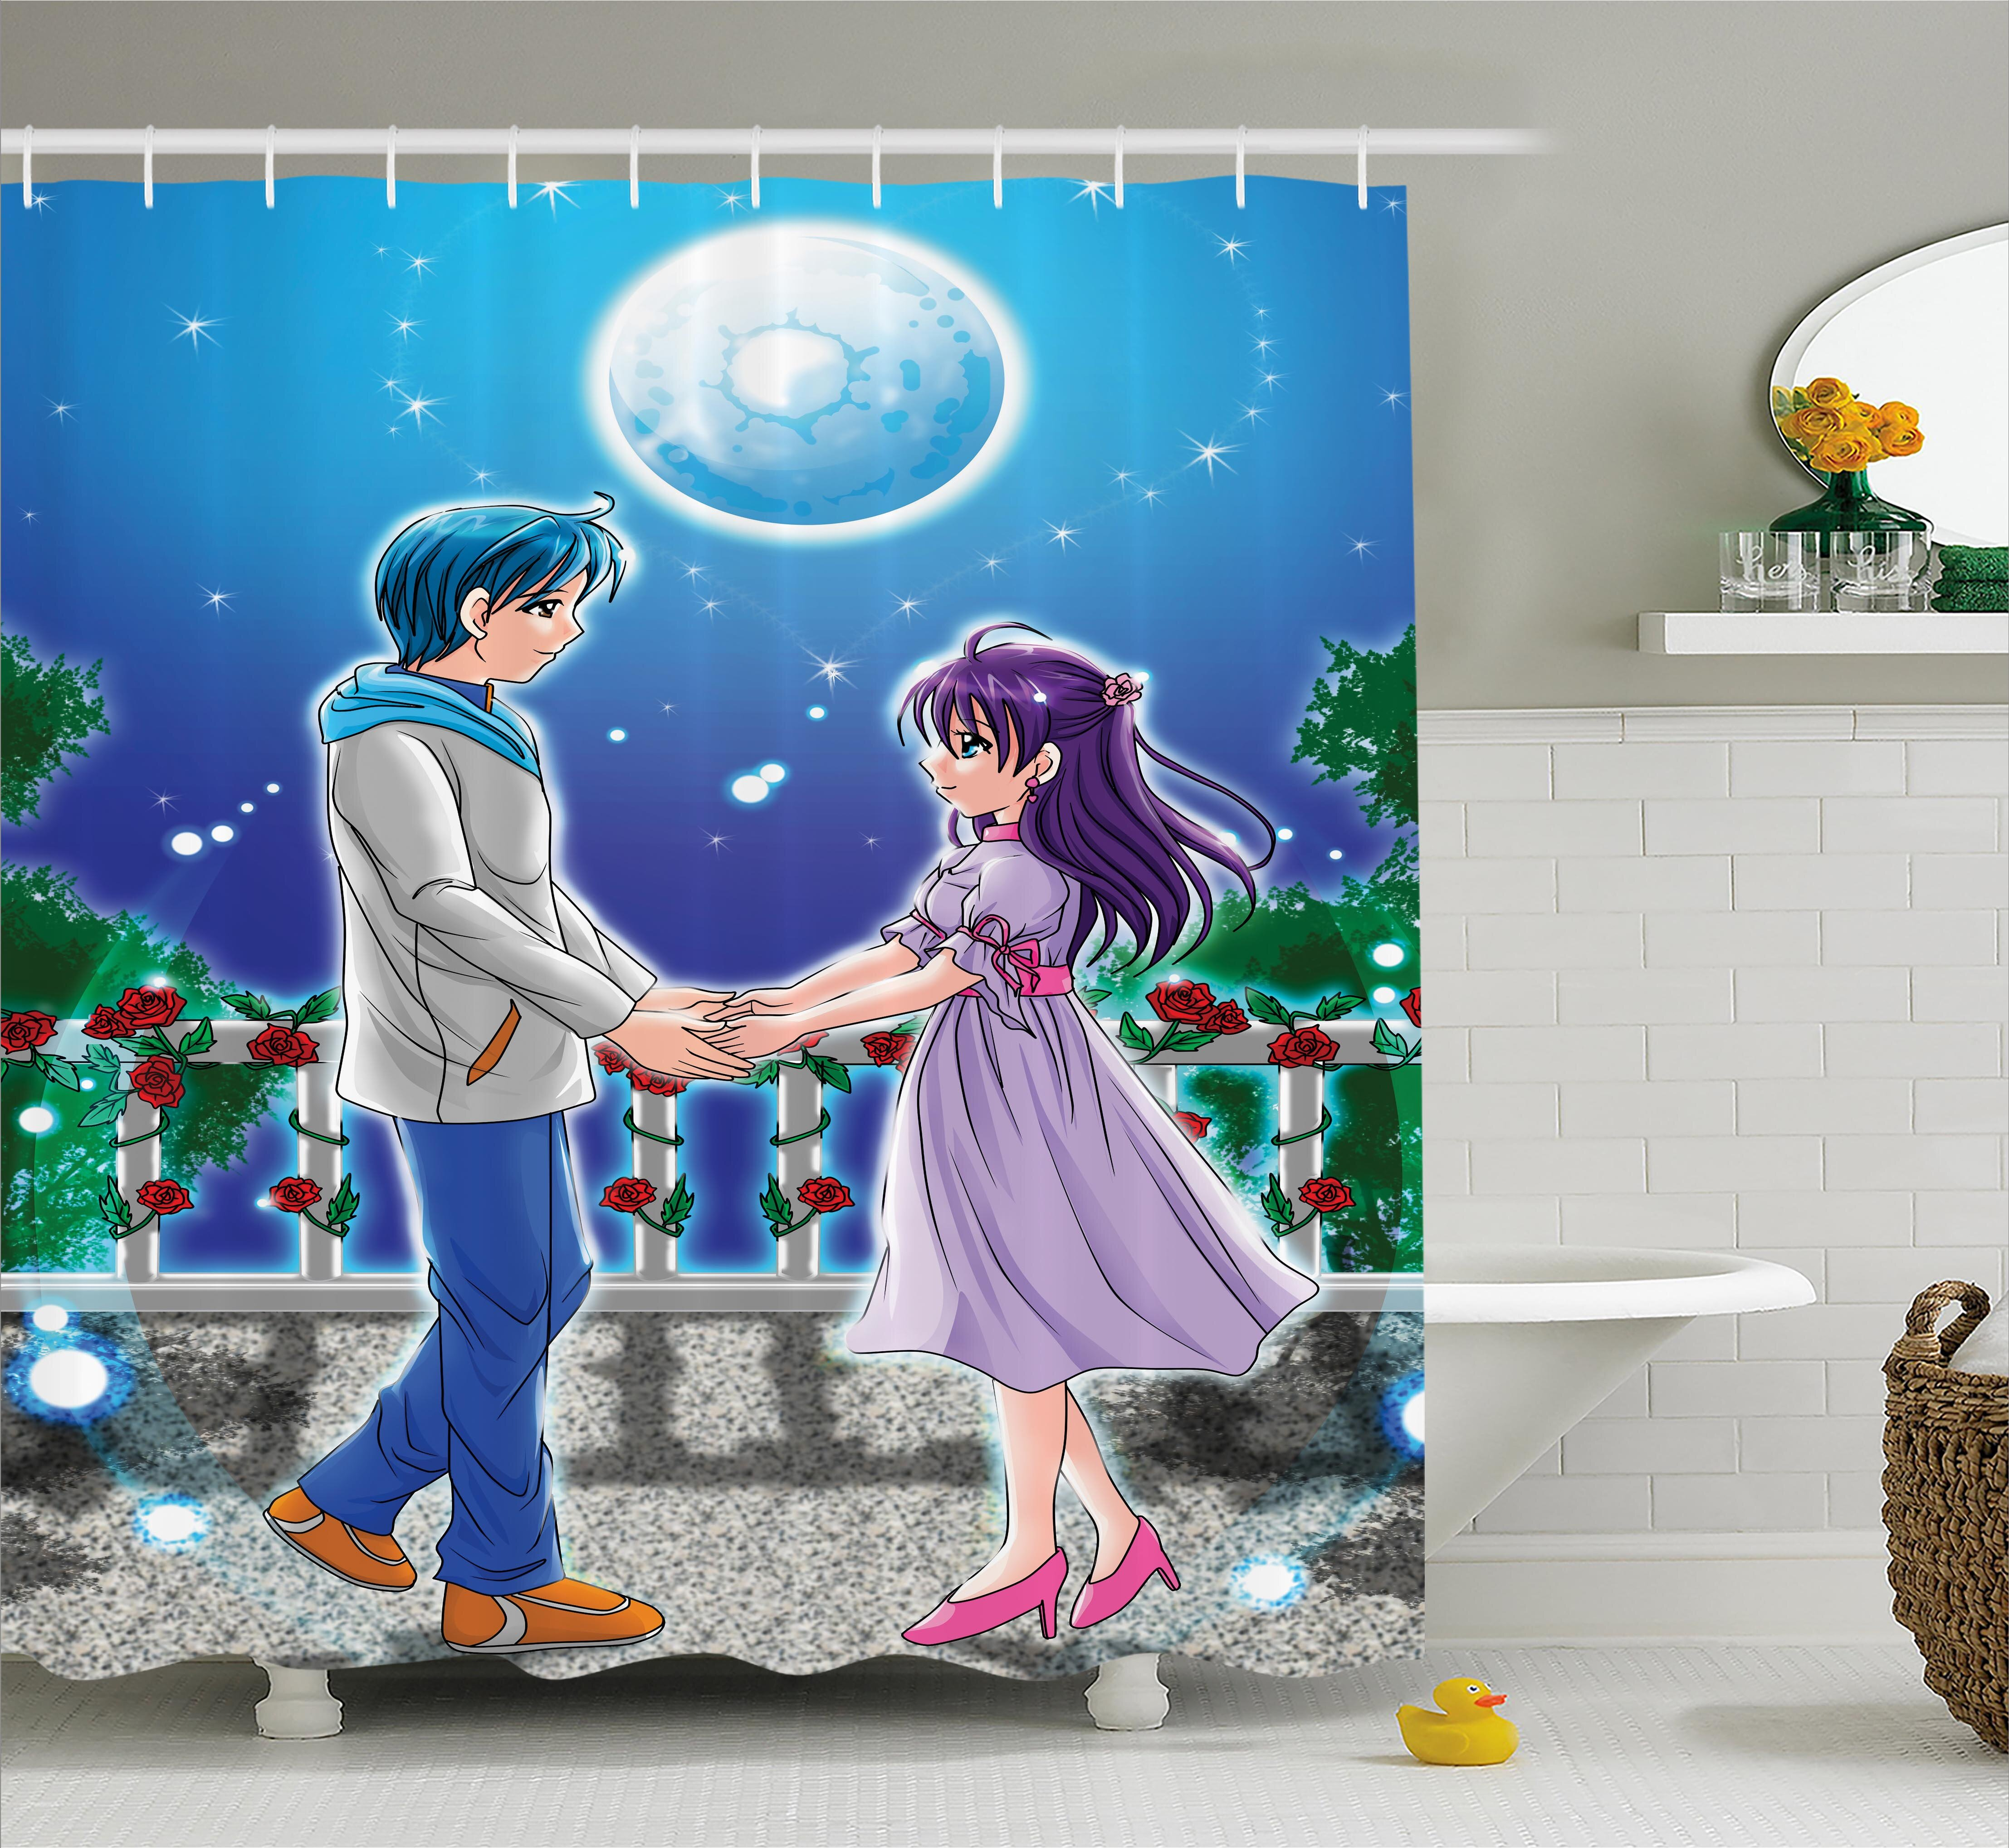 East Urban Home Anime Decor Romantic Manga Shower Curtain Wayfair